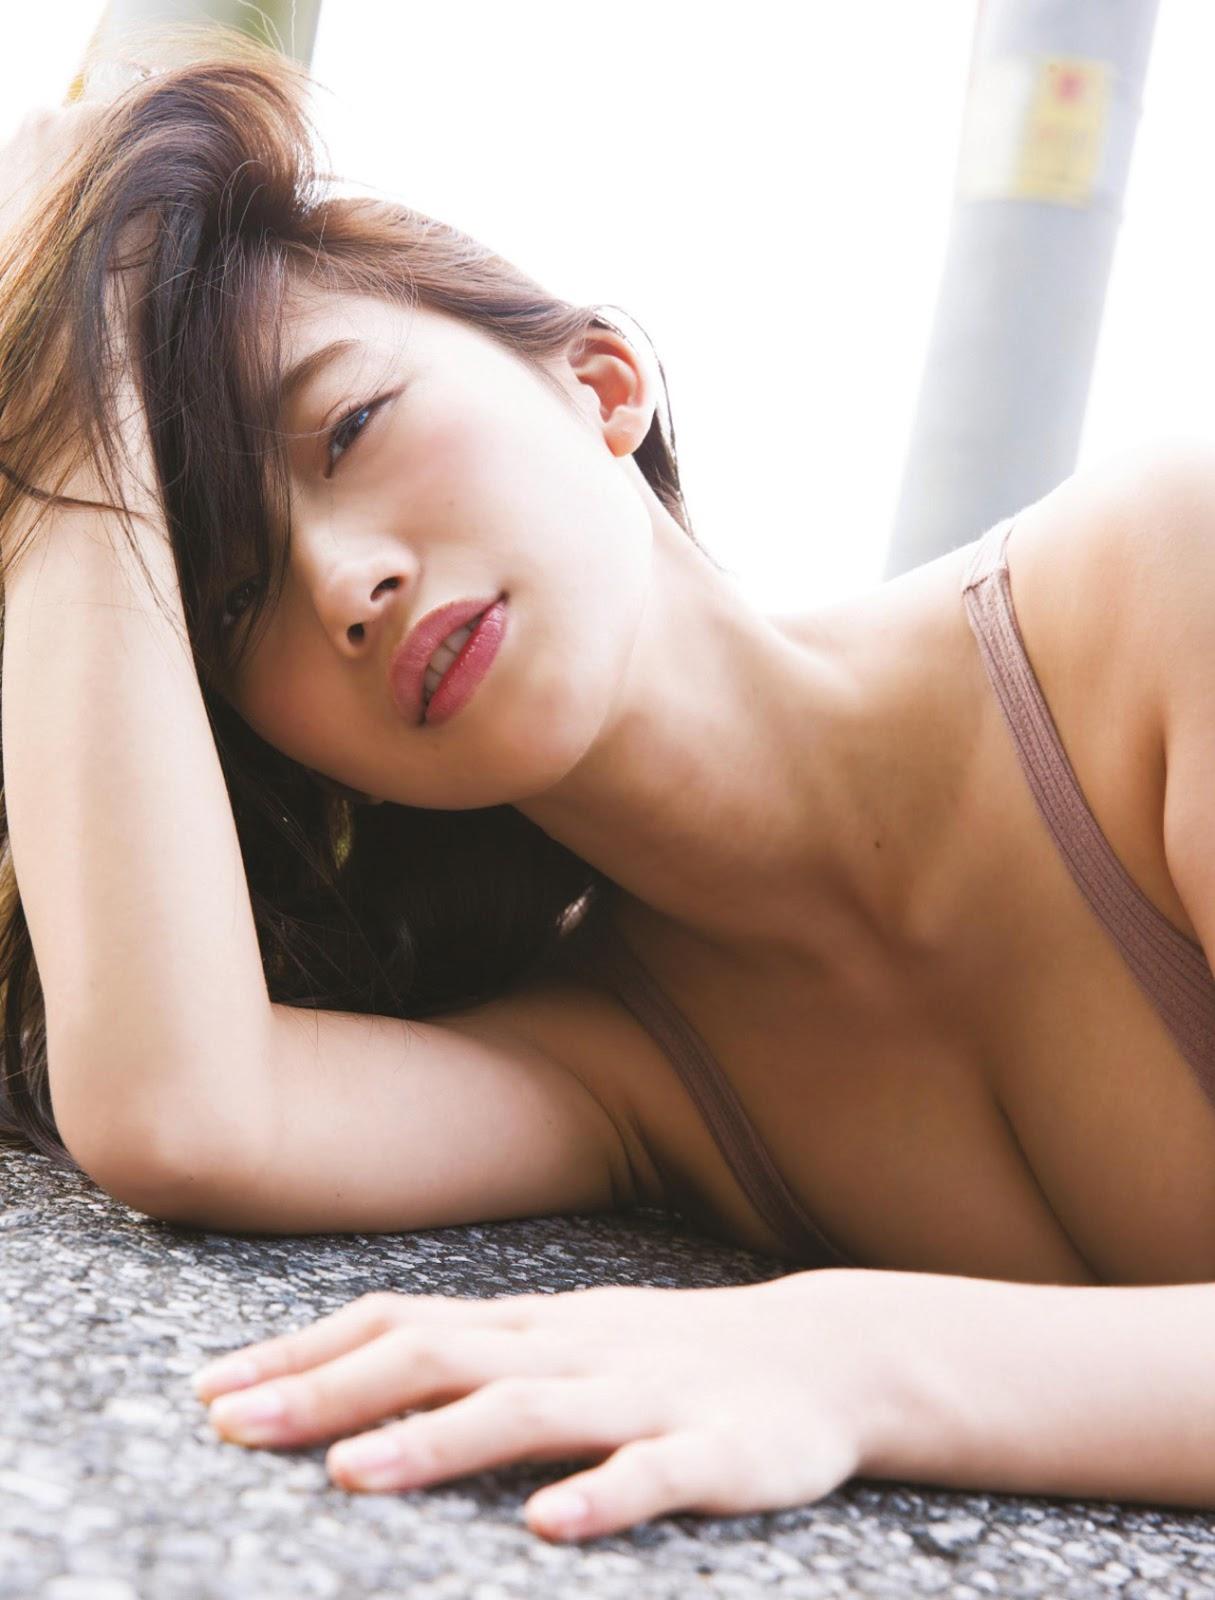 Yuka Ogura 小倉優香, Weekly SPA! 2018.01.02 (週刊SPA! 2018年01月02日号)